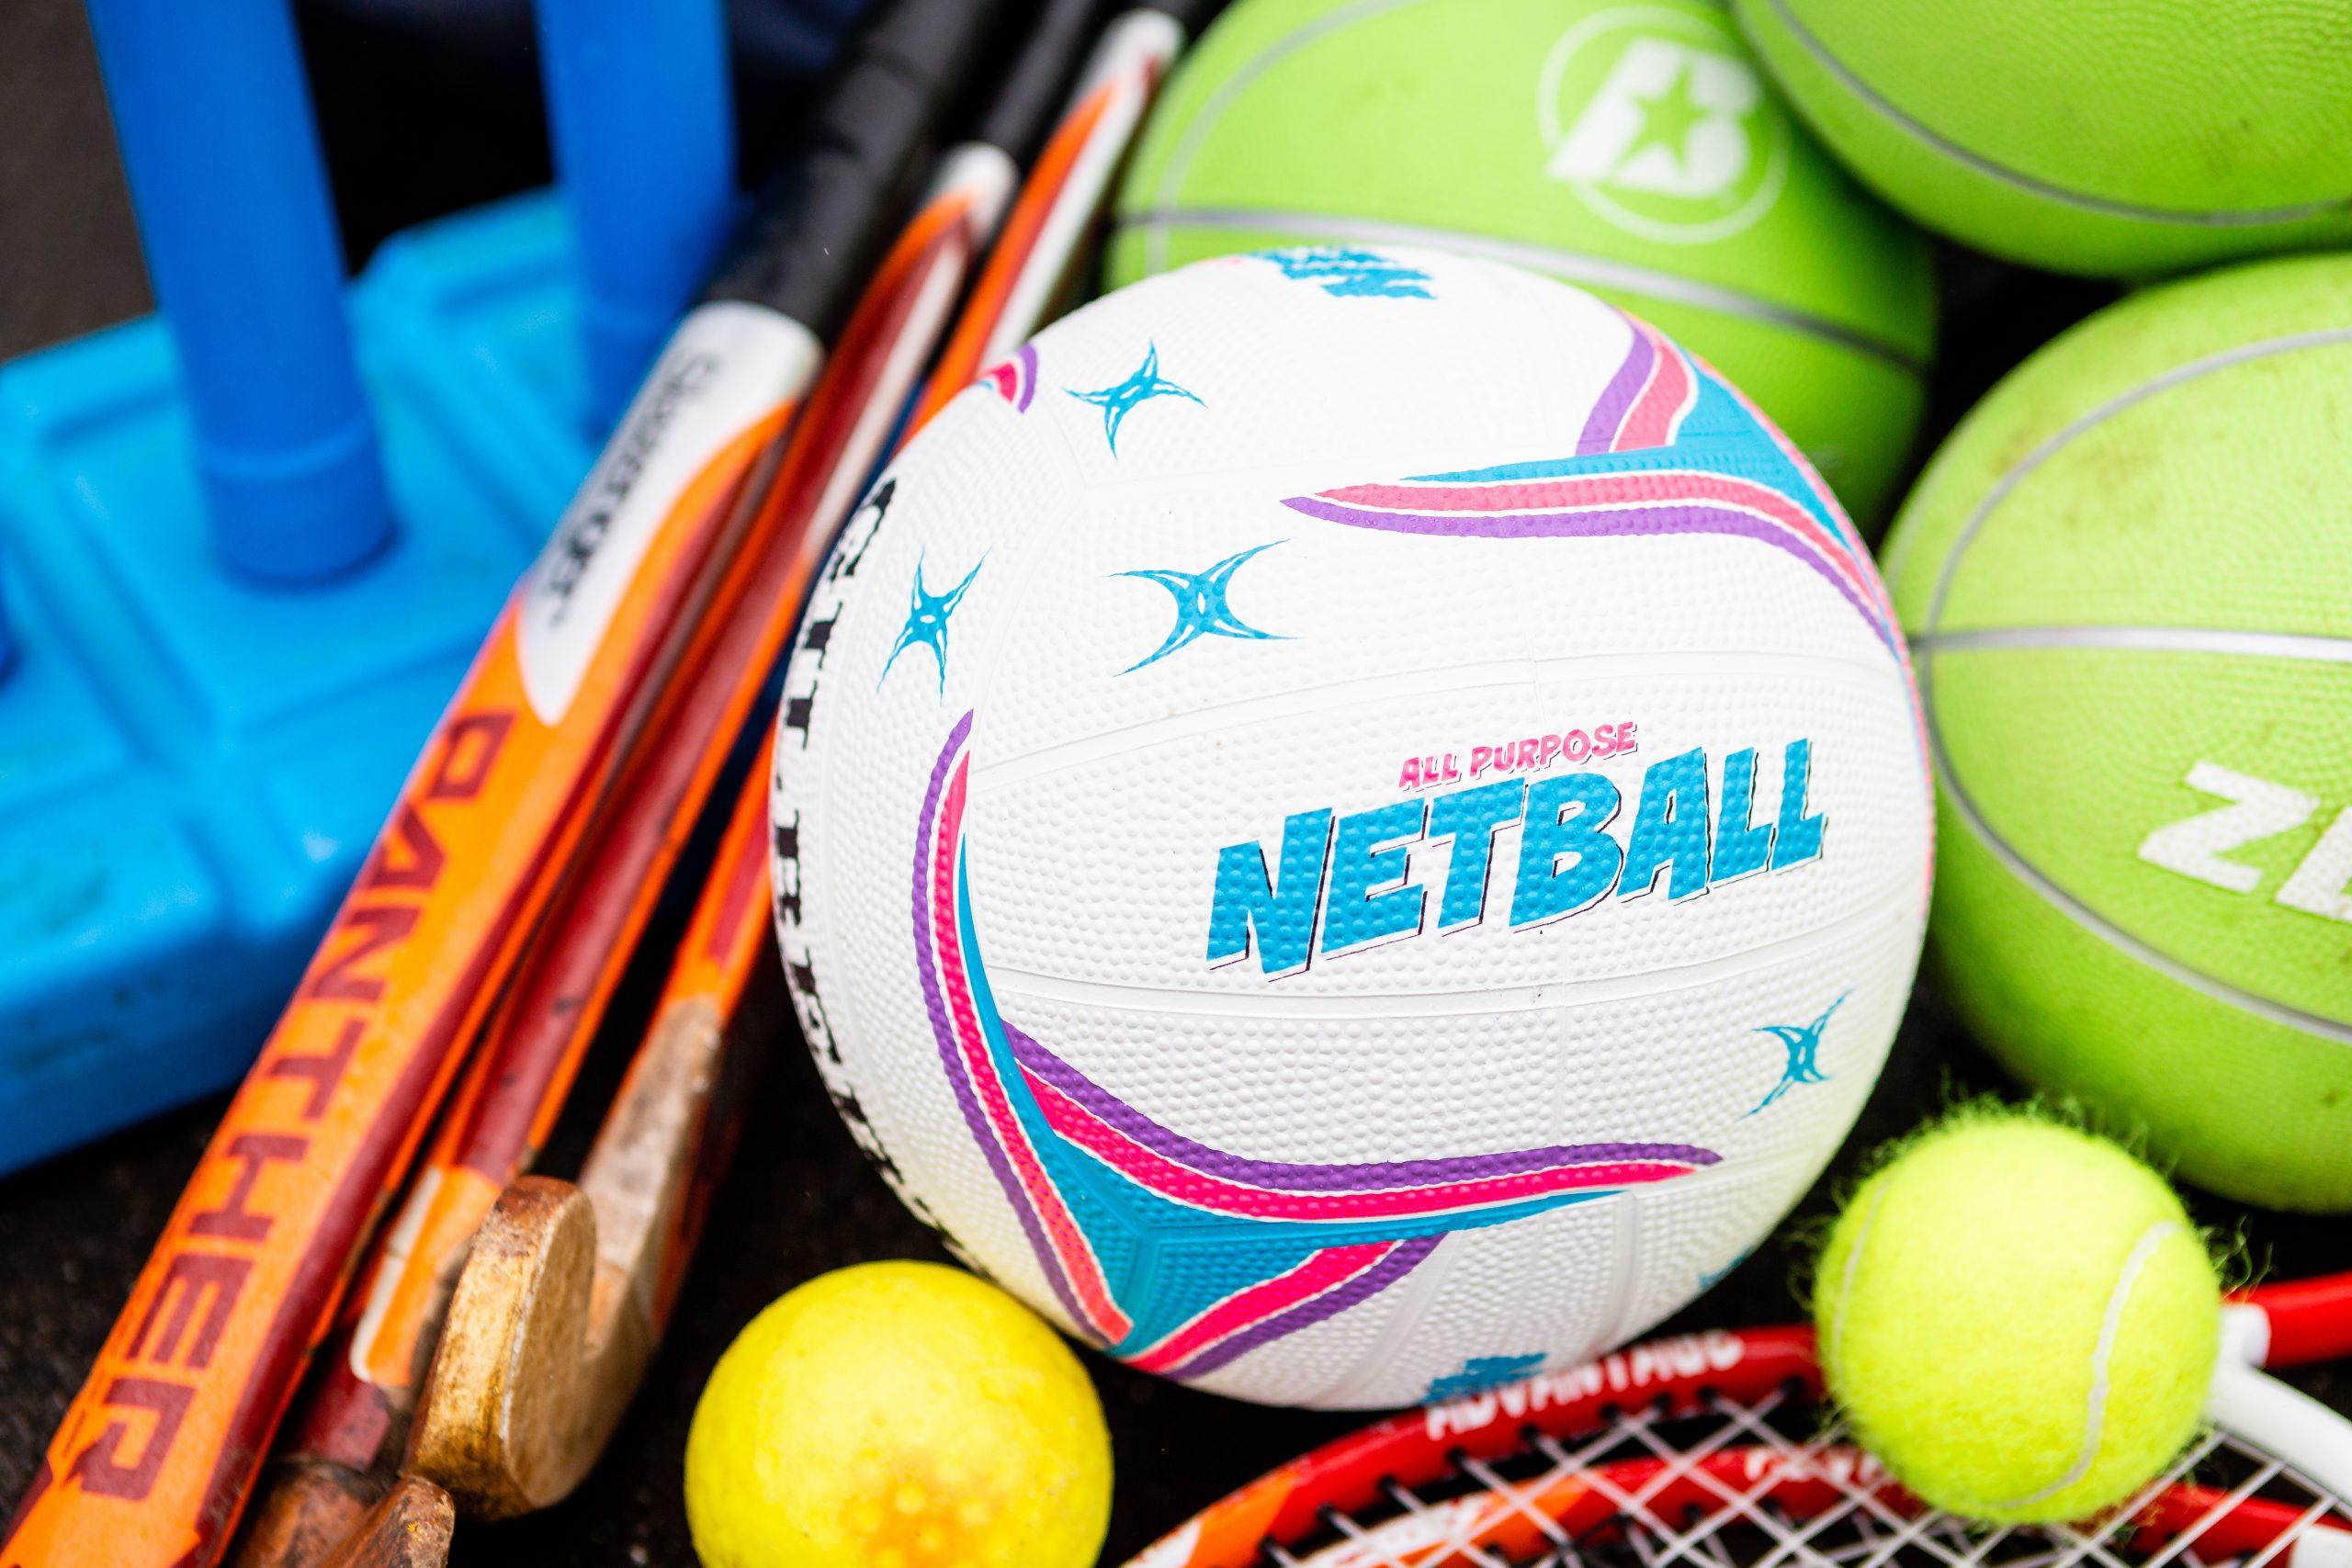 PlaySport - Netball, Tennis Ball, Hockey Stick and Cricket Stumps